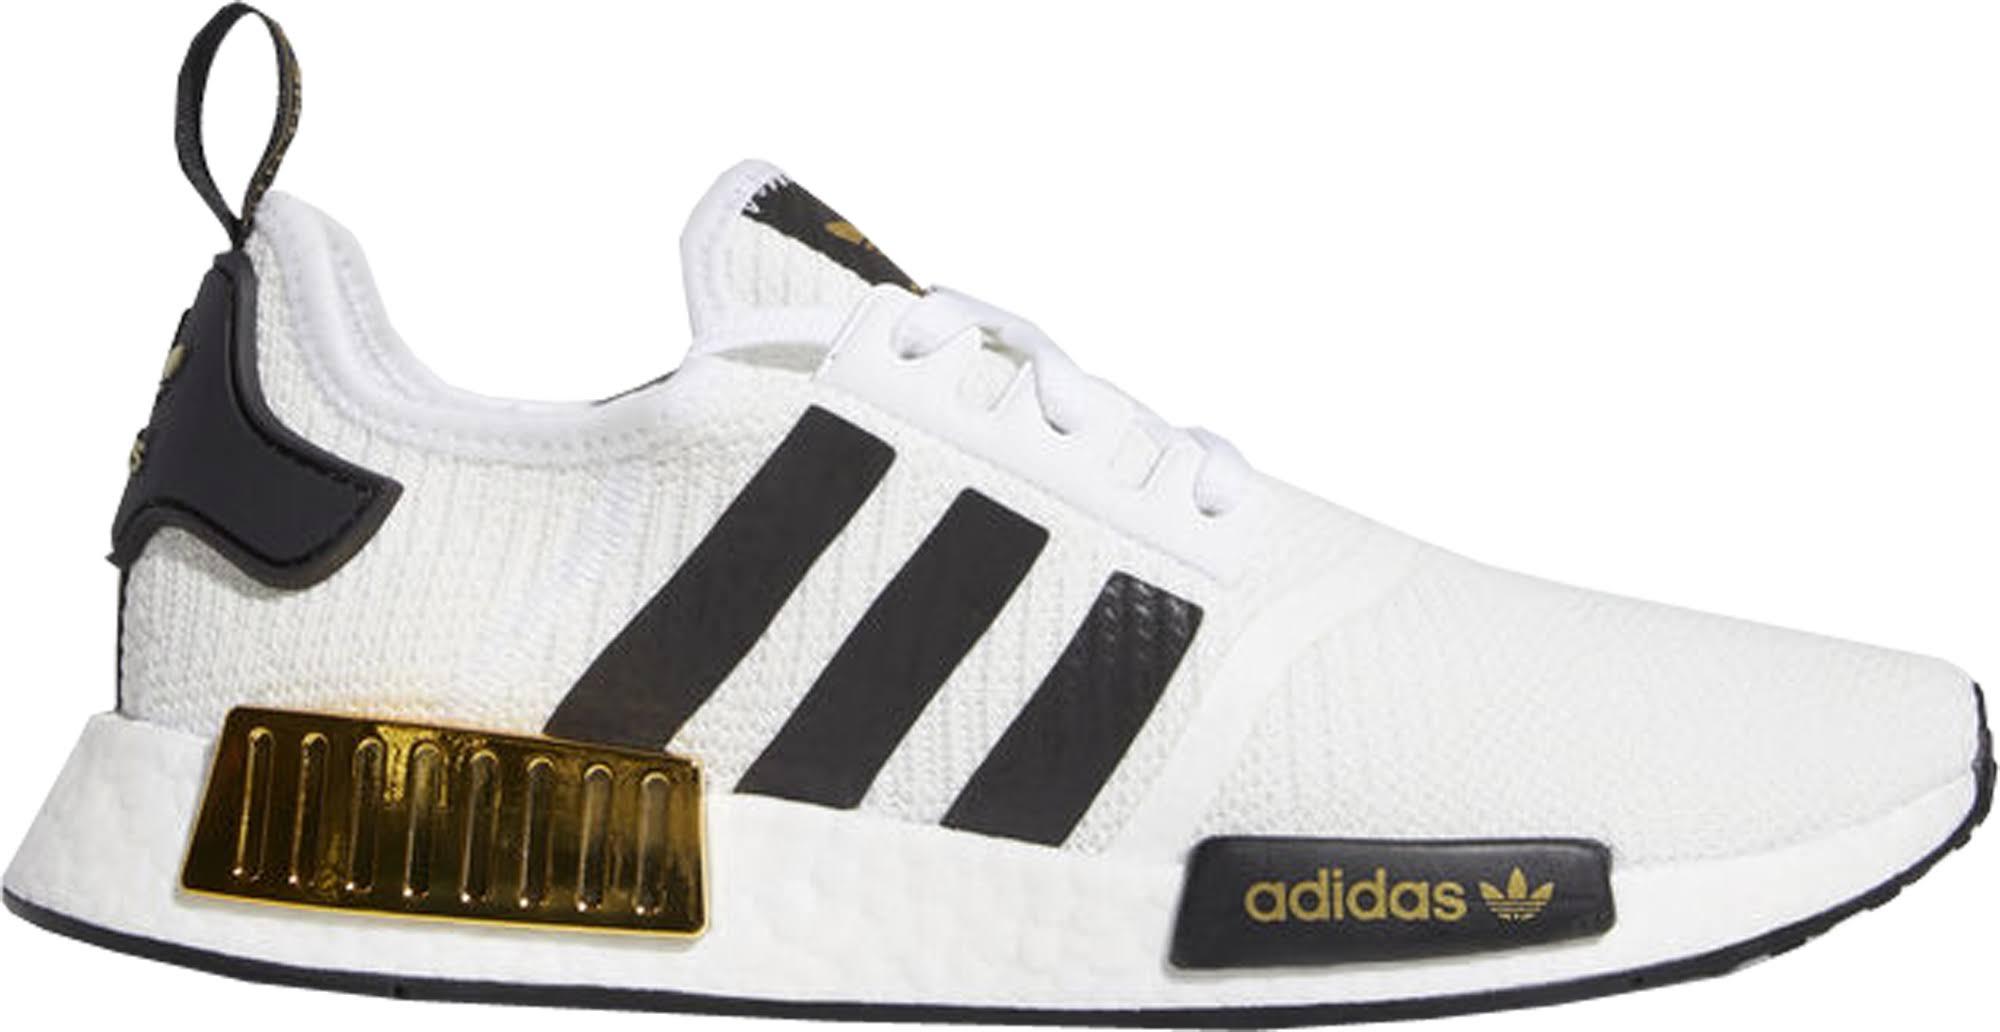 adidas NMD R1 White Black Gold